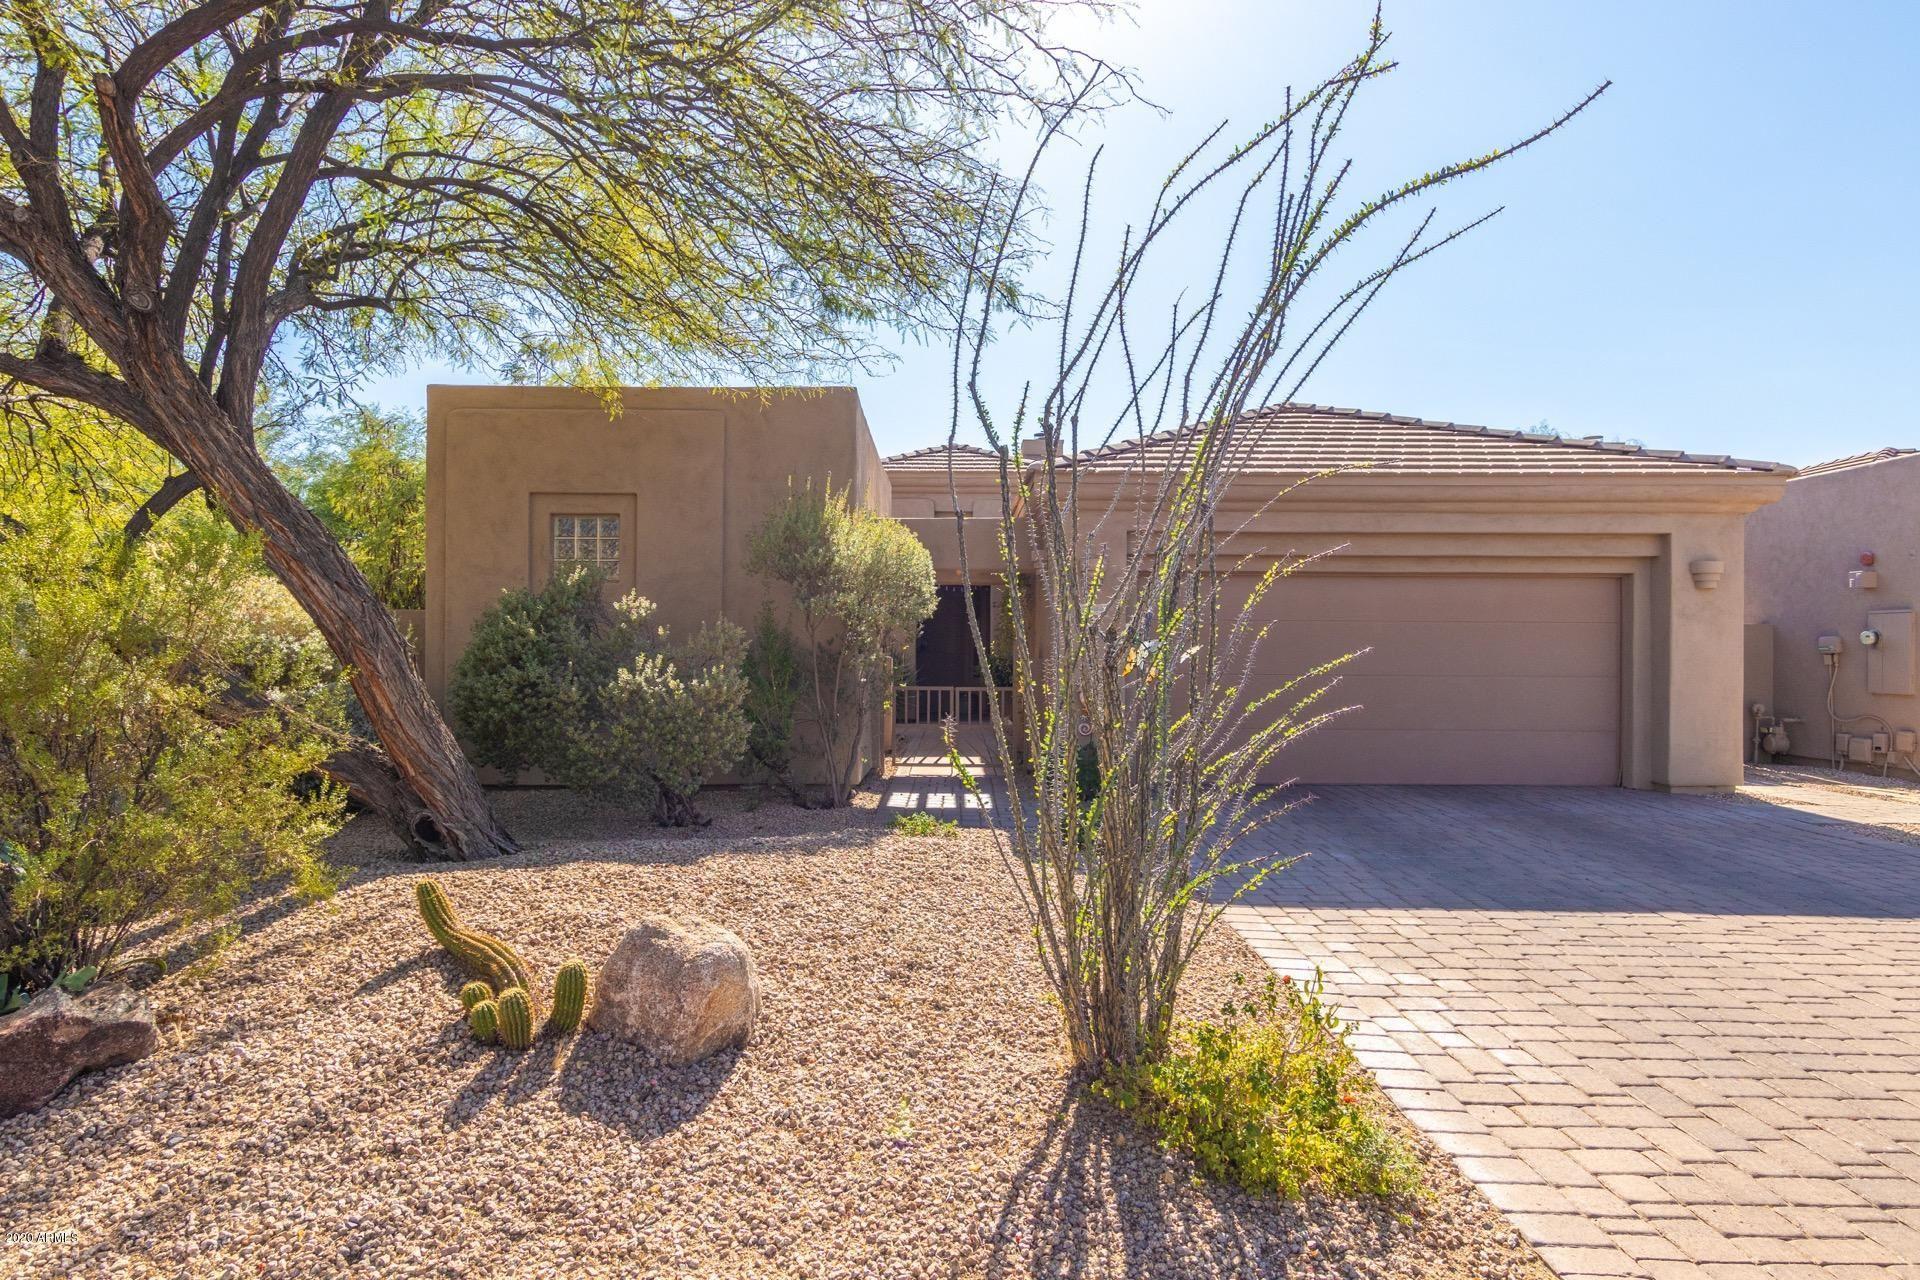 32944 N 70TH Street, Scottsdale, AZ 85266 - #: 6143199